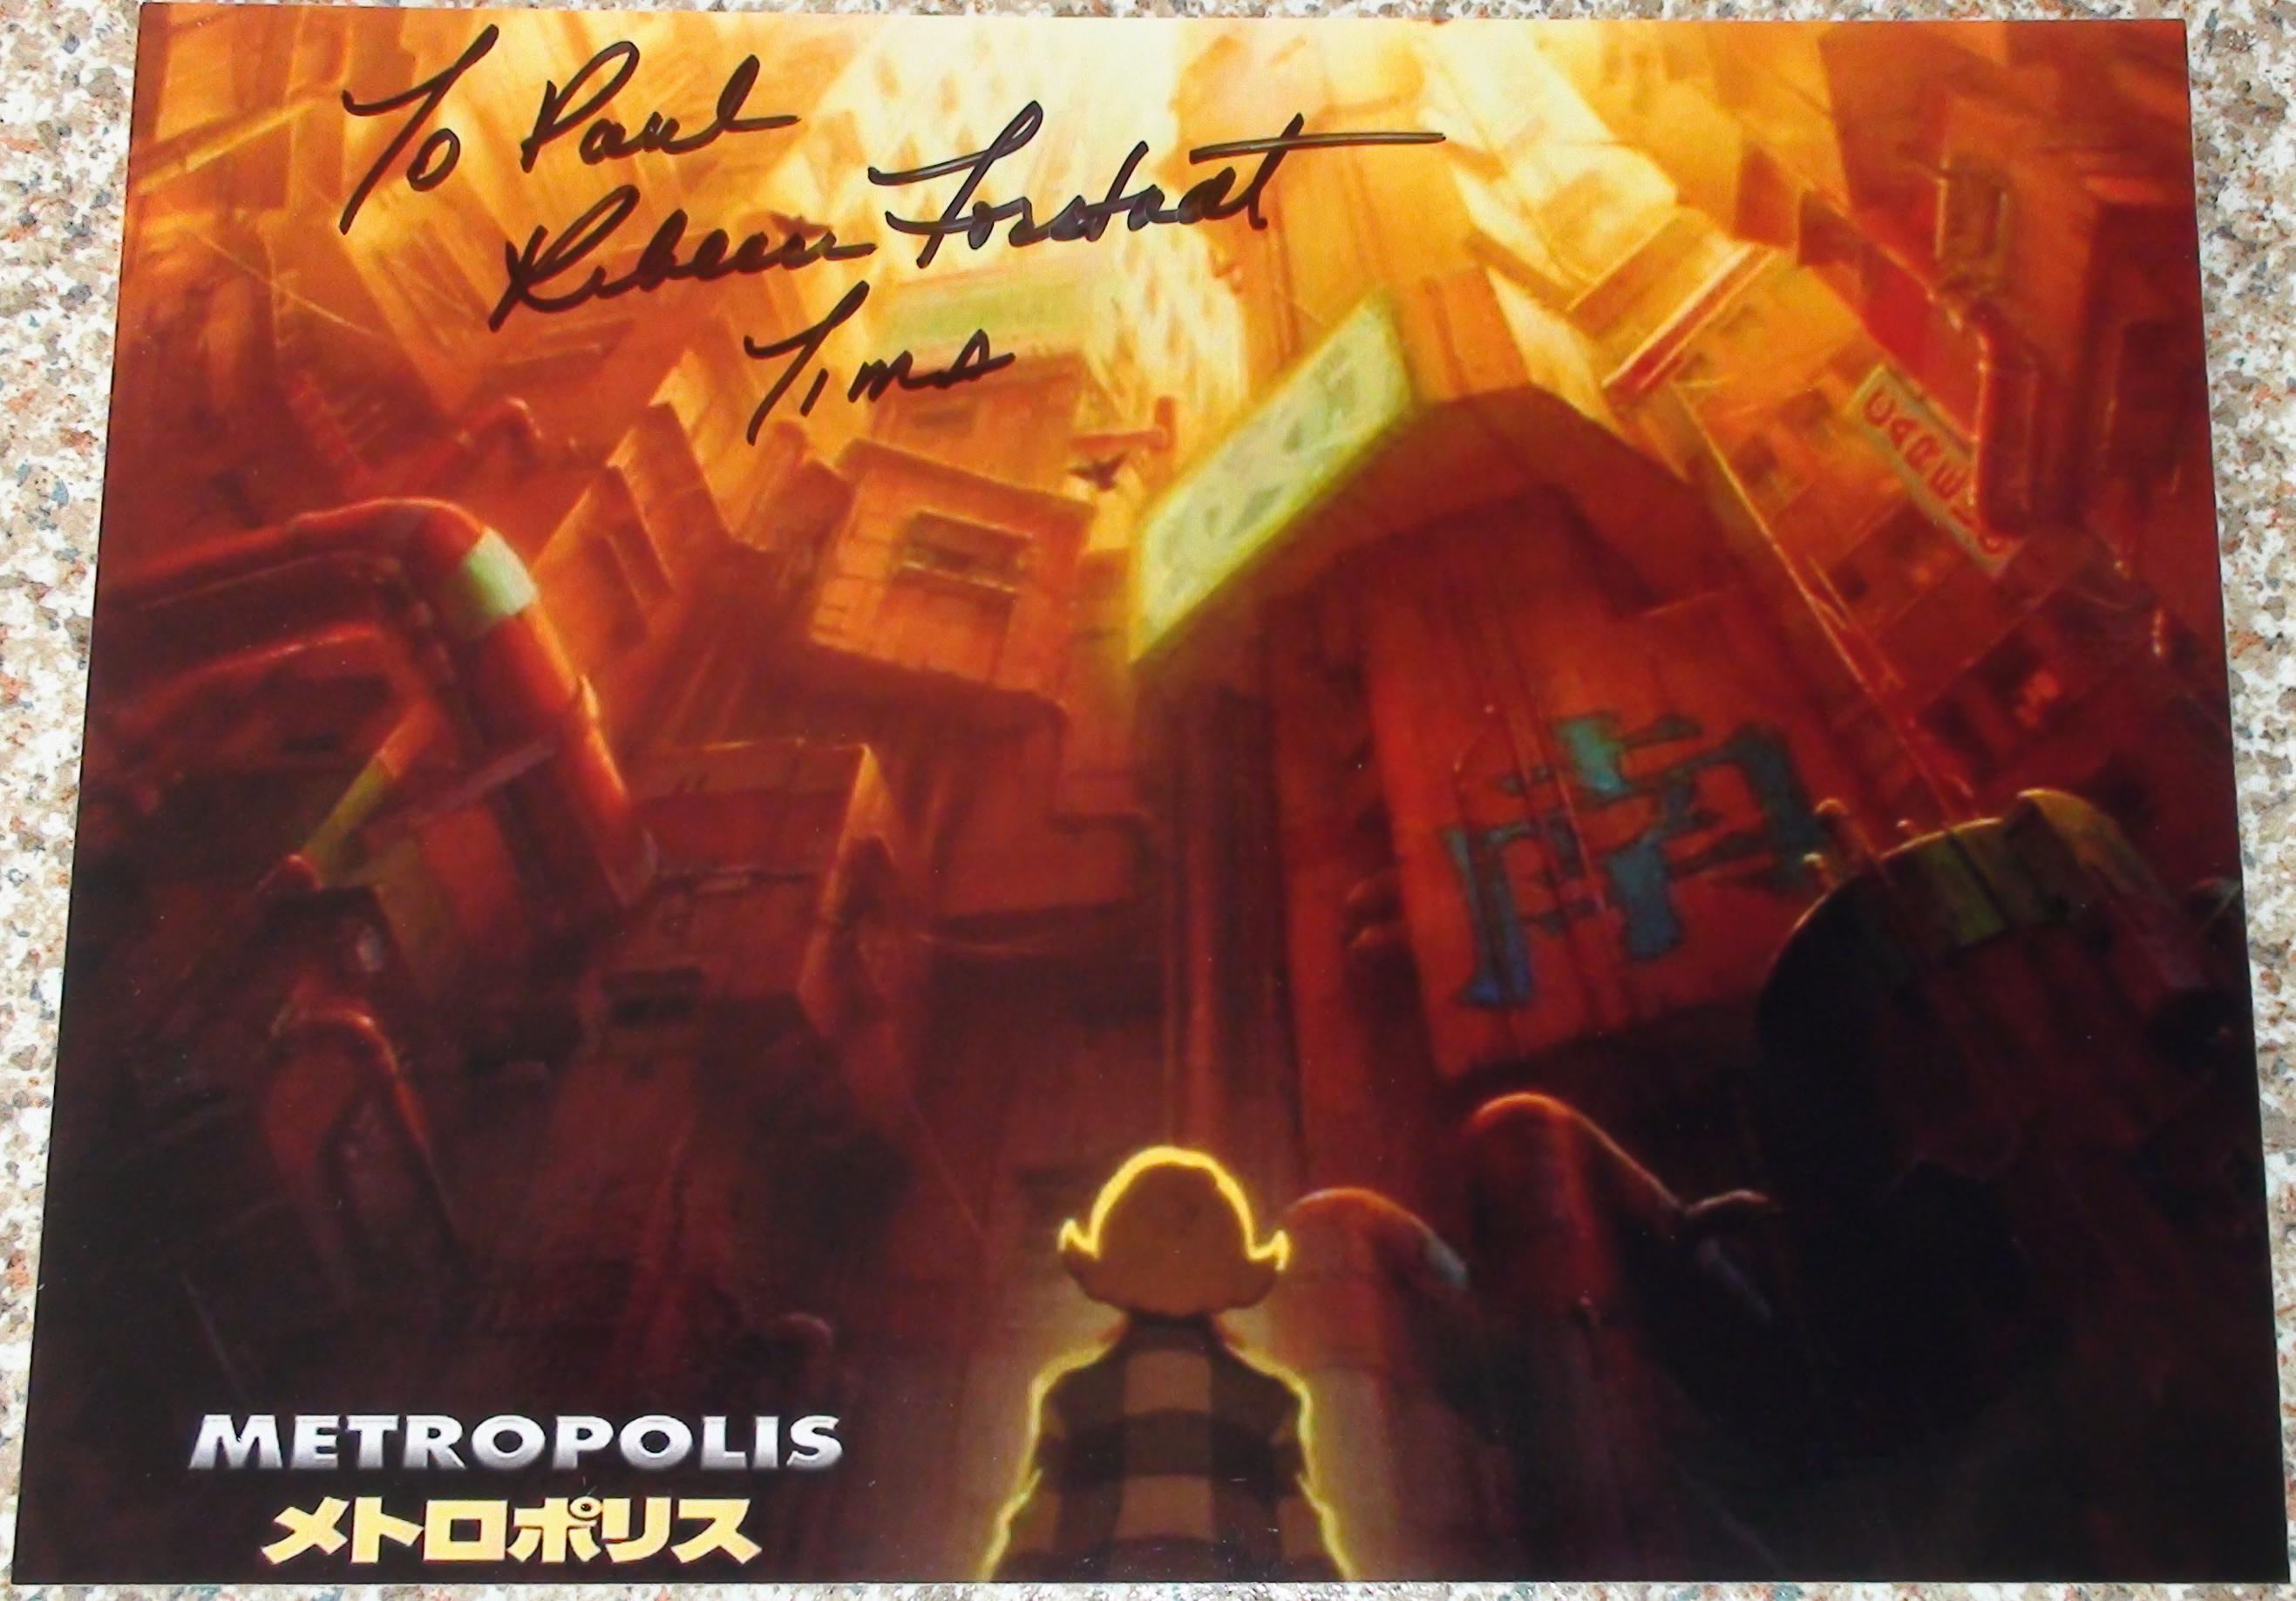 Metropolis - Rebecca Forstadt